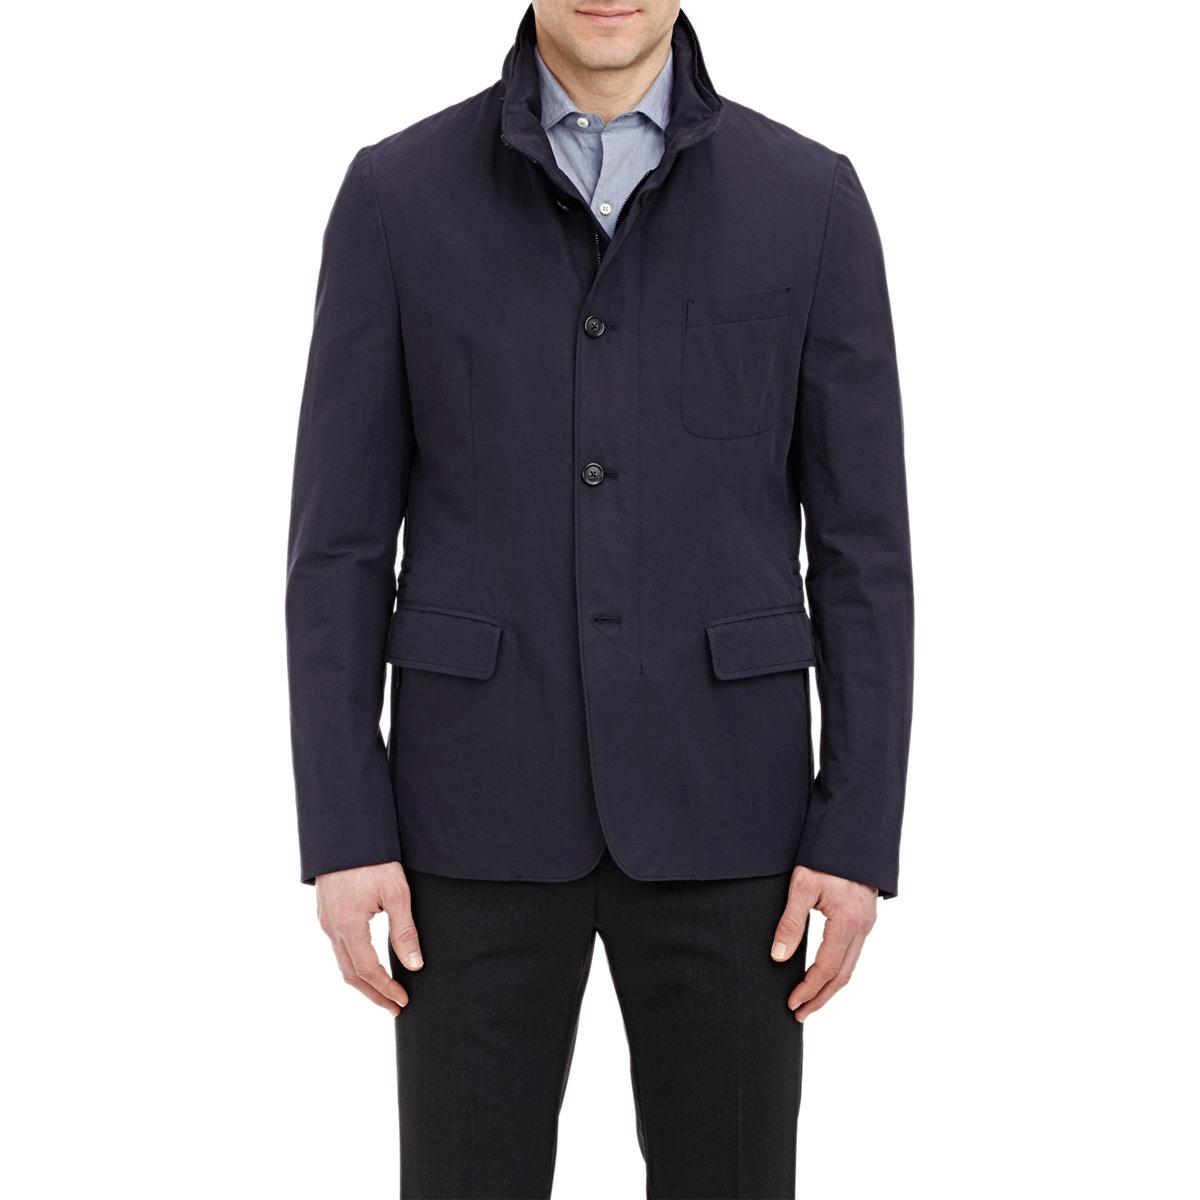 Jav tech blue blazer